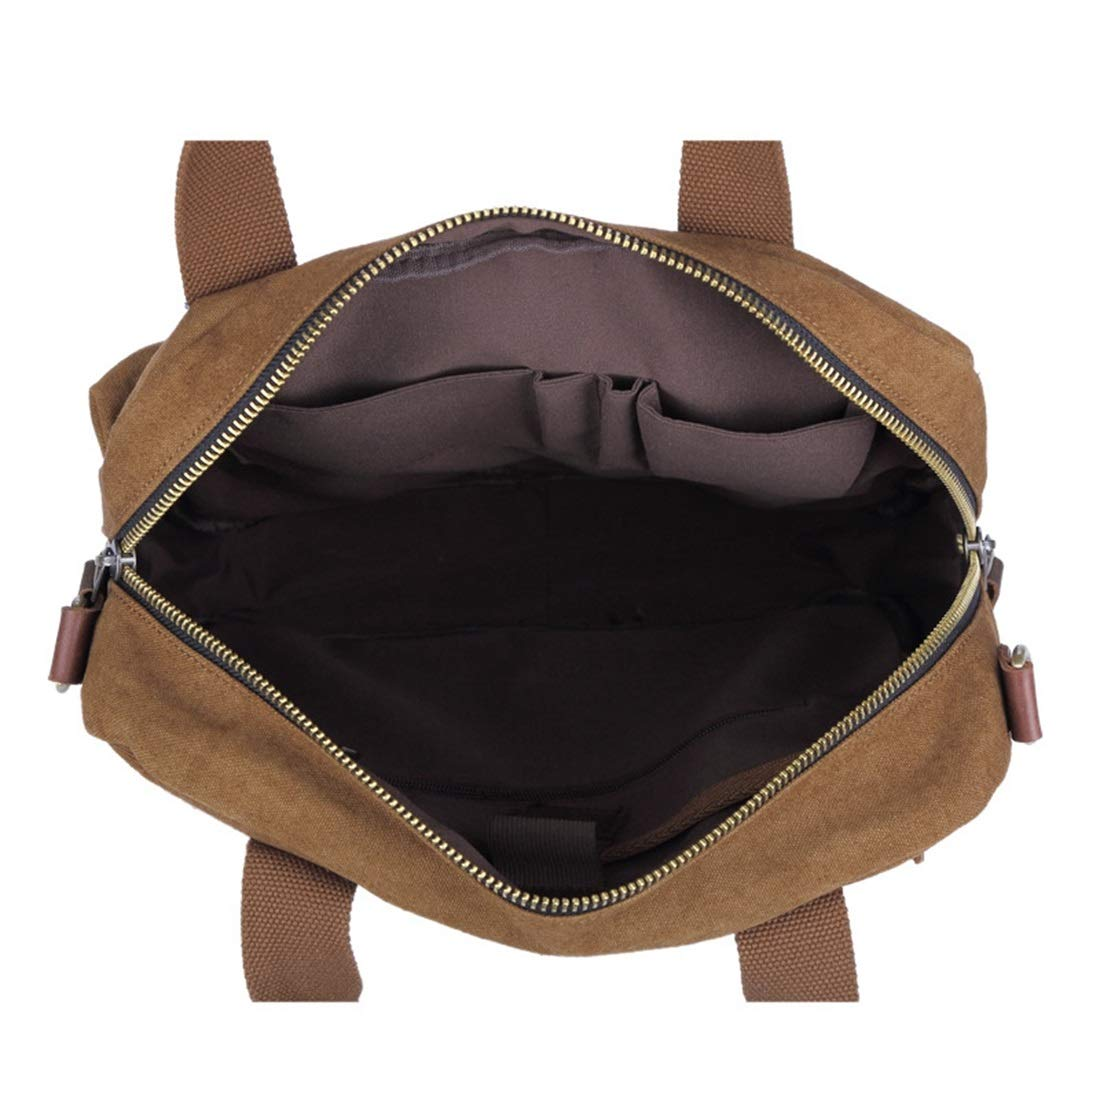 Color : Dark Green YUKILO Office Canvas Retro European Style Briefcase Shoulder Messenger Crossbody Satchel Casual Bag Holder for Men Business